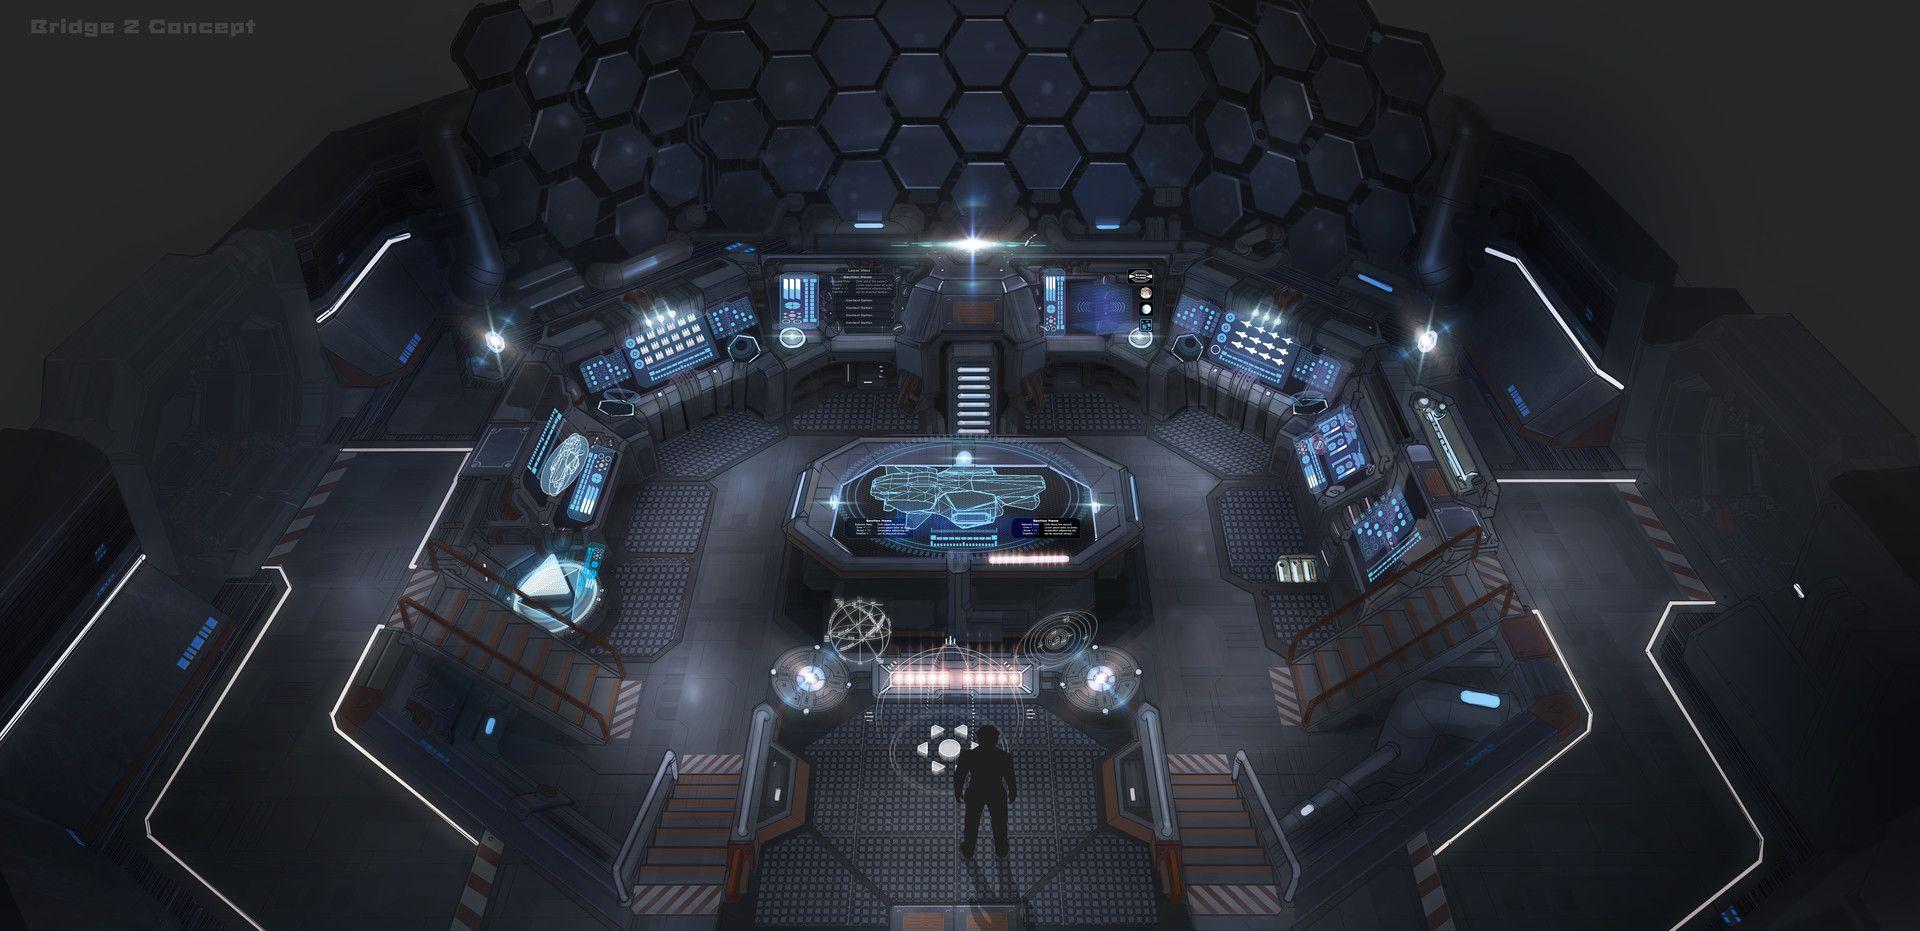 ArtStation - Bridge Concept, Garret AJ | Story: Future in 2019